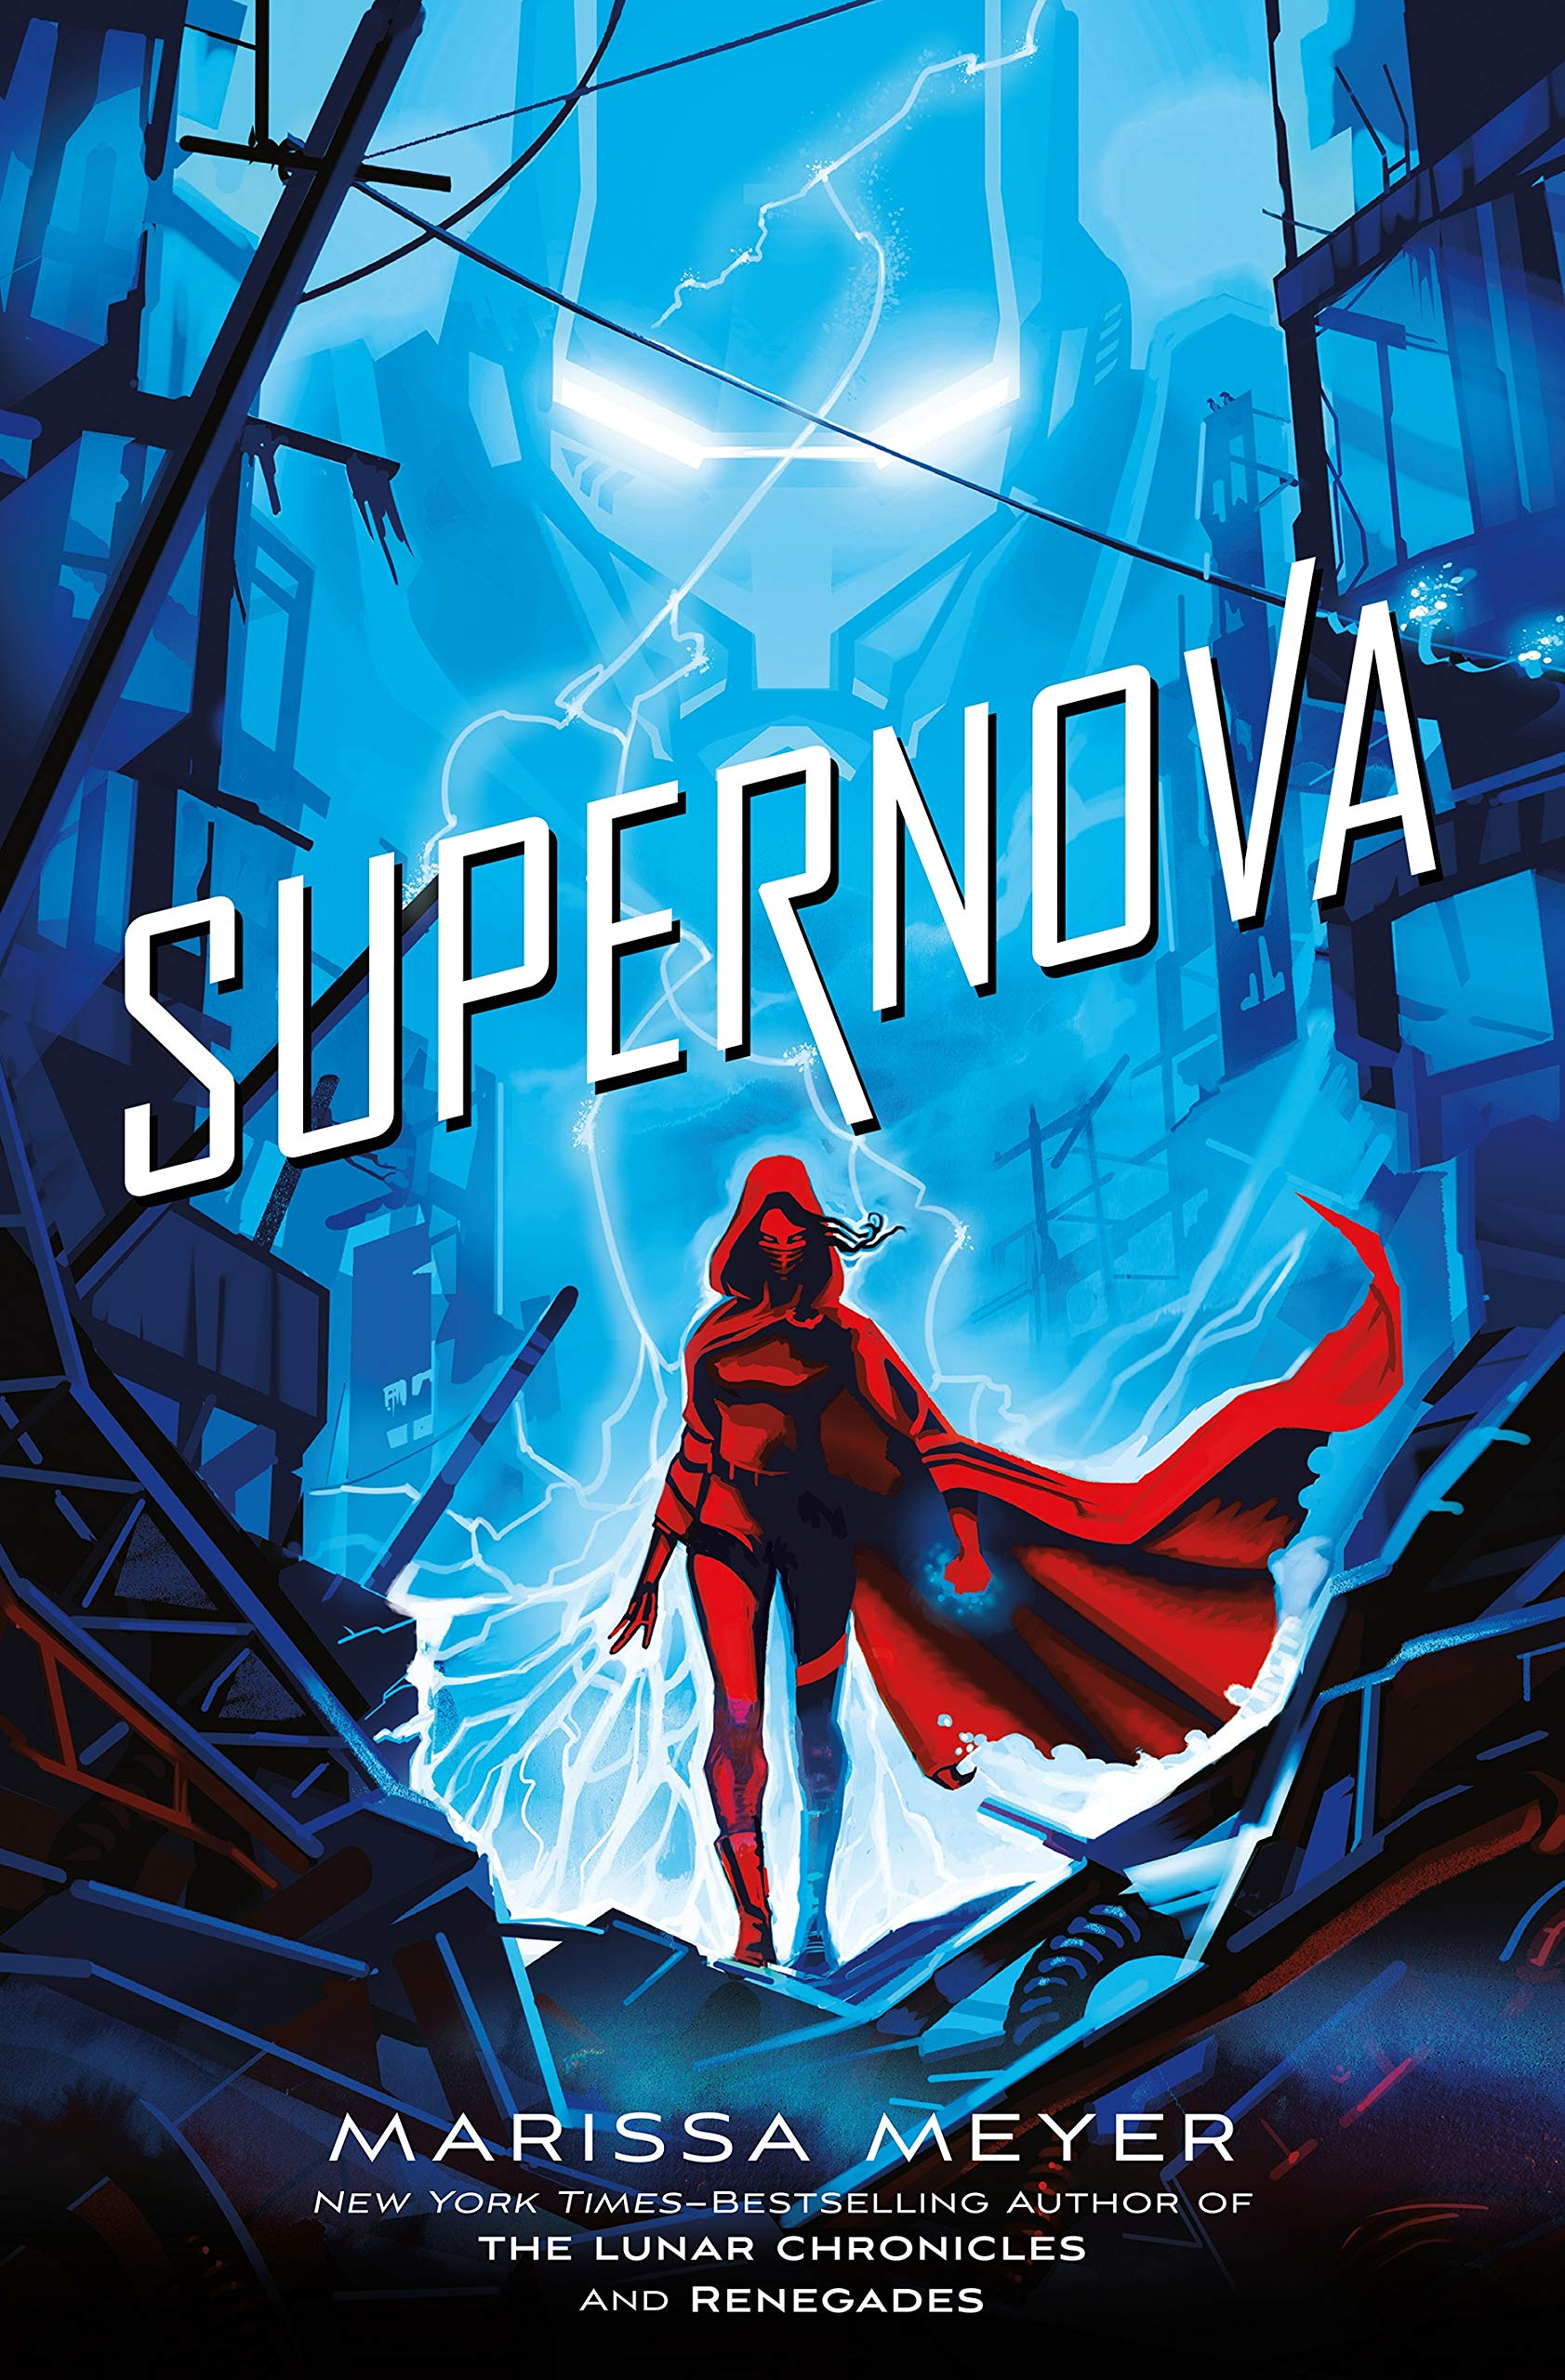 Amazon.com: Supernova (9781250078384): Meyer, Marissa: Books